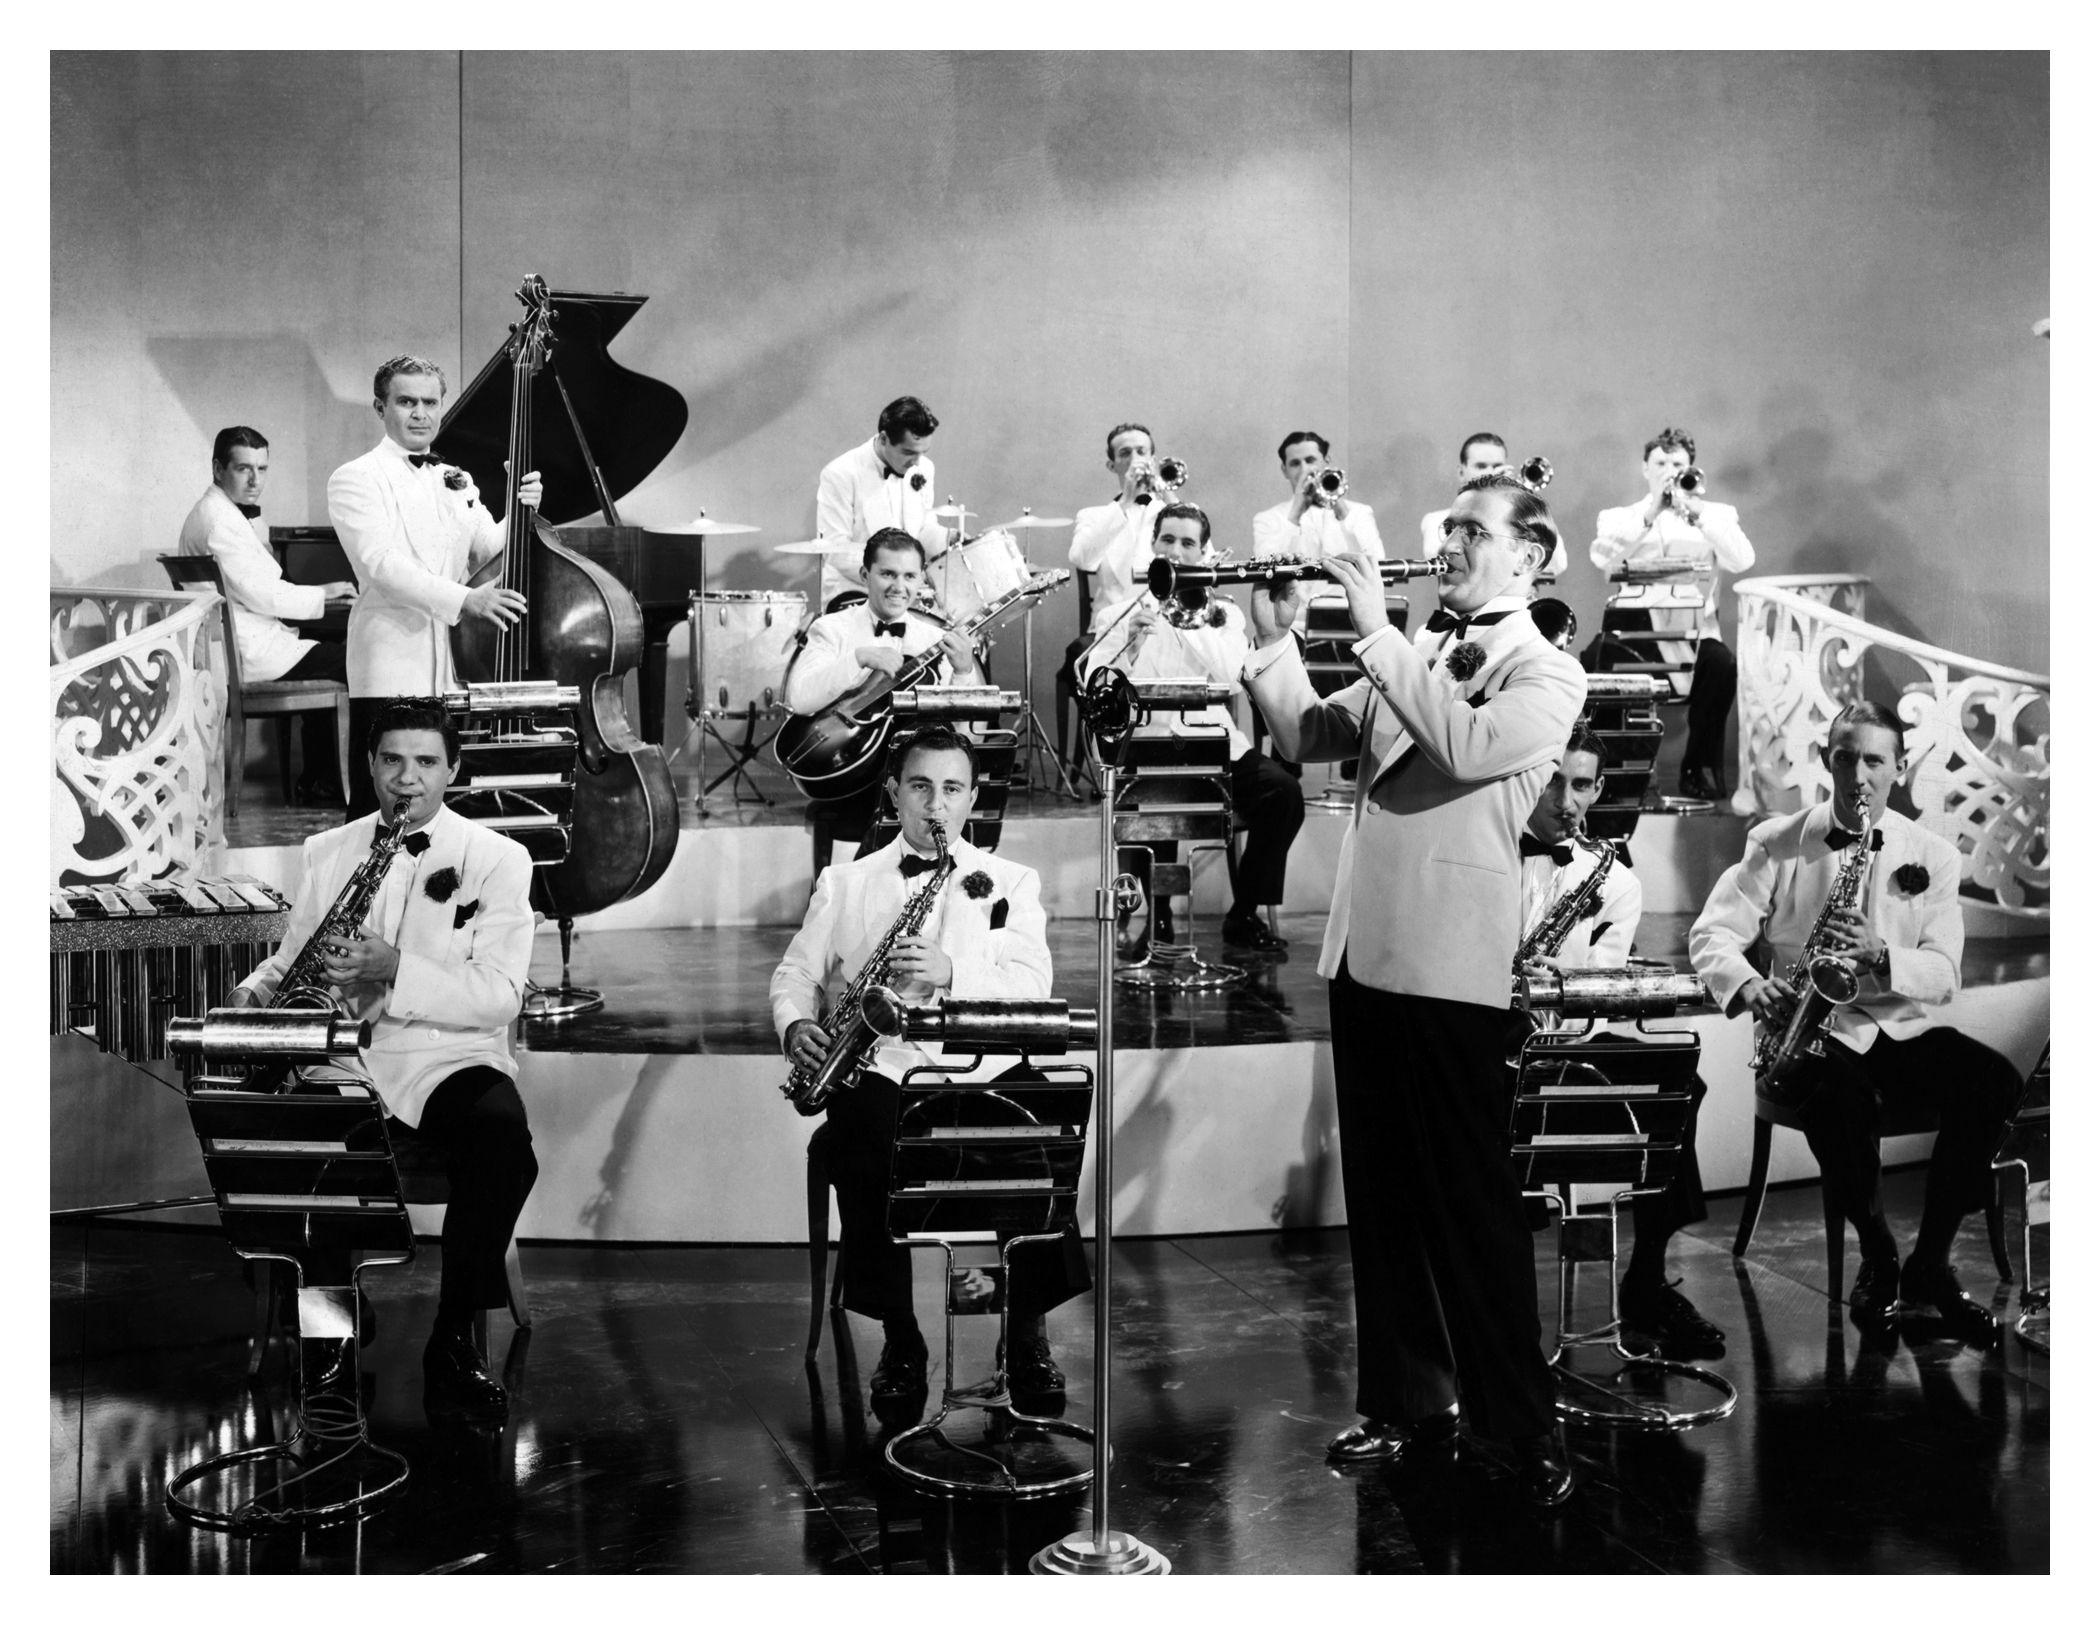 tinhte-jazz-history-9.jpg